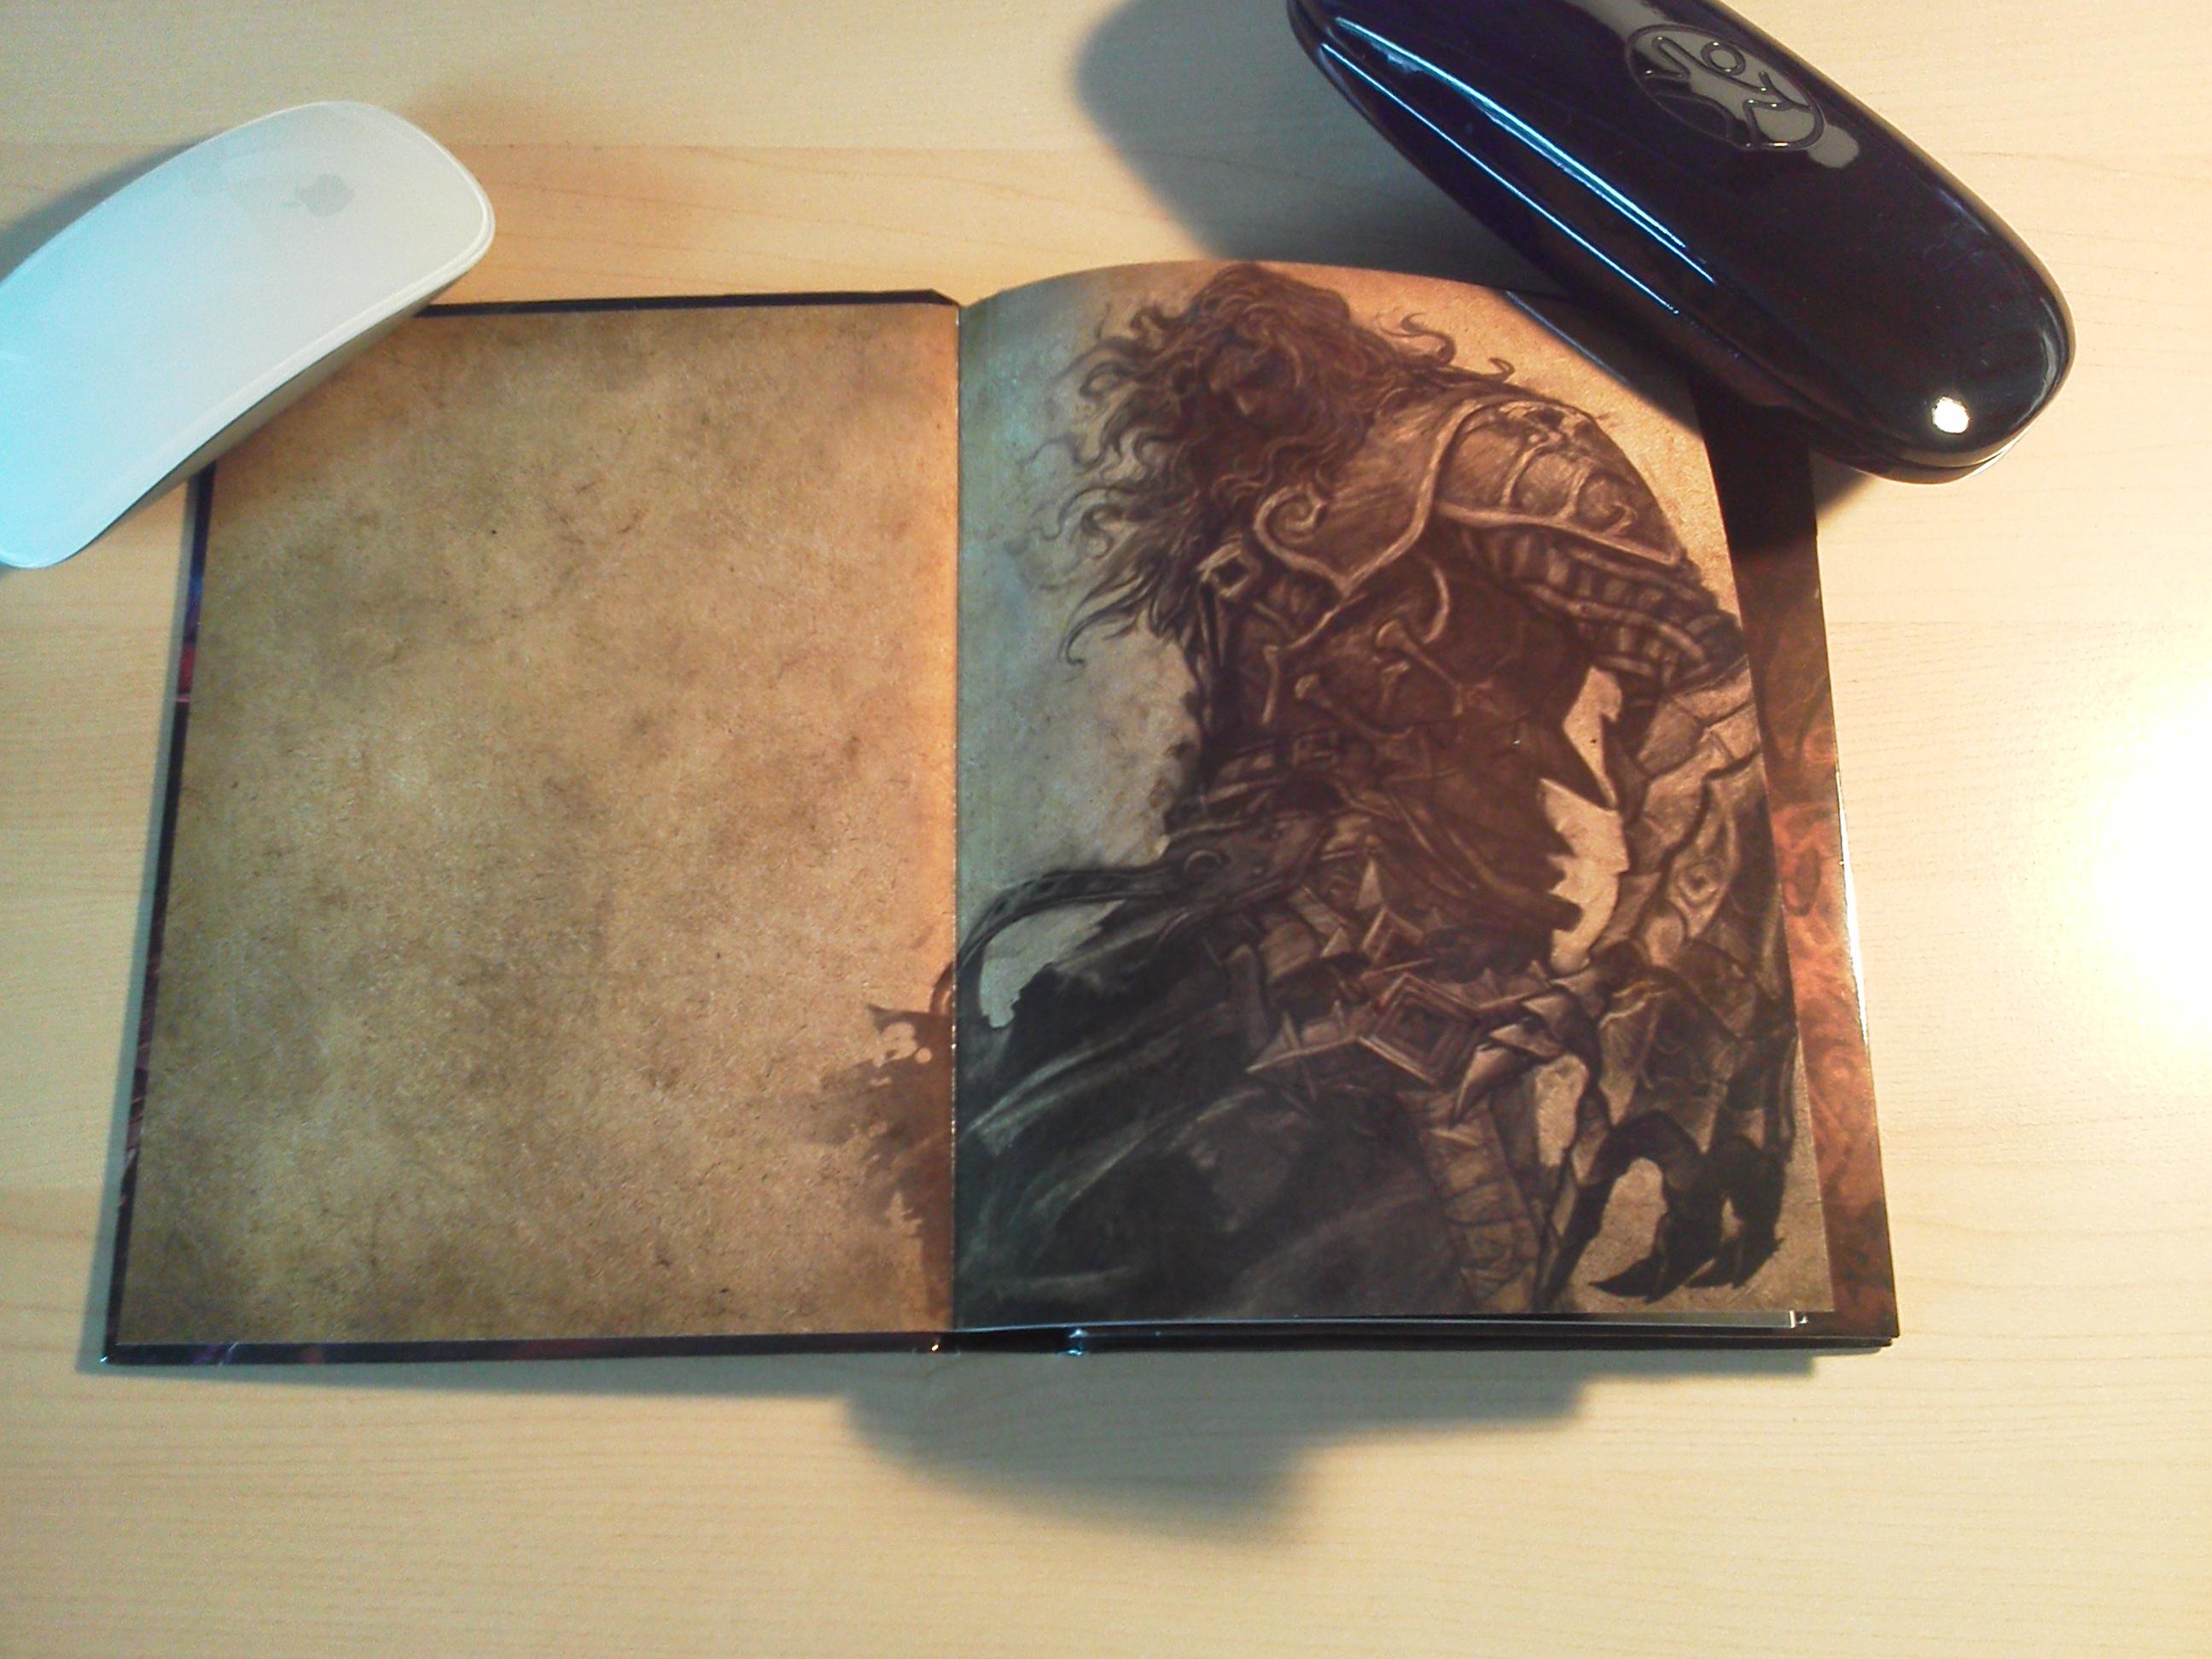 Pdf shadow lords 2 castlevania of artbook